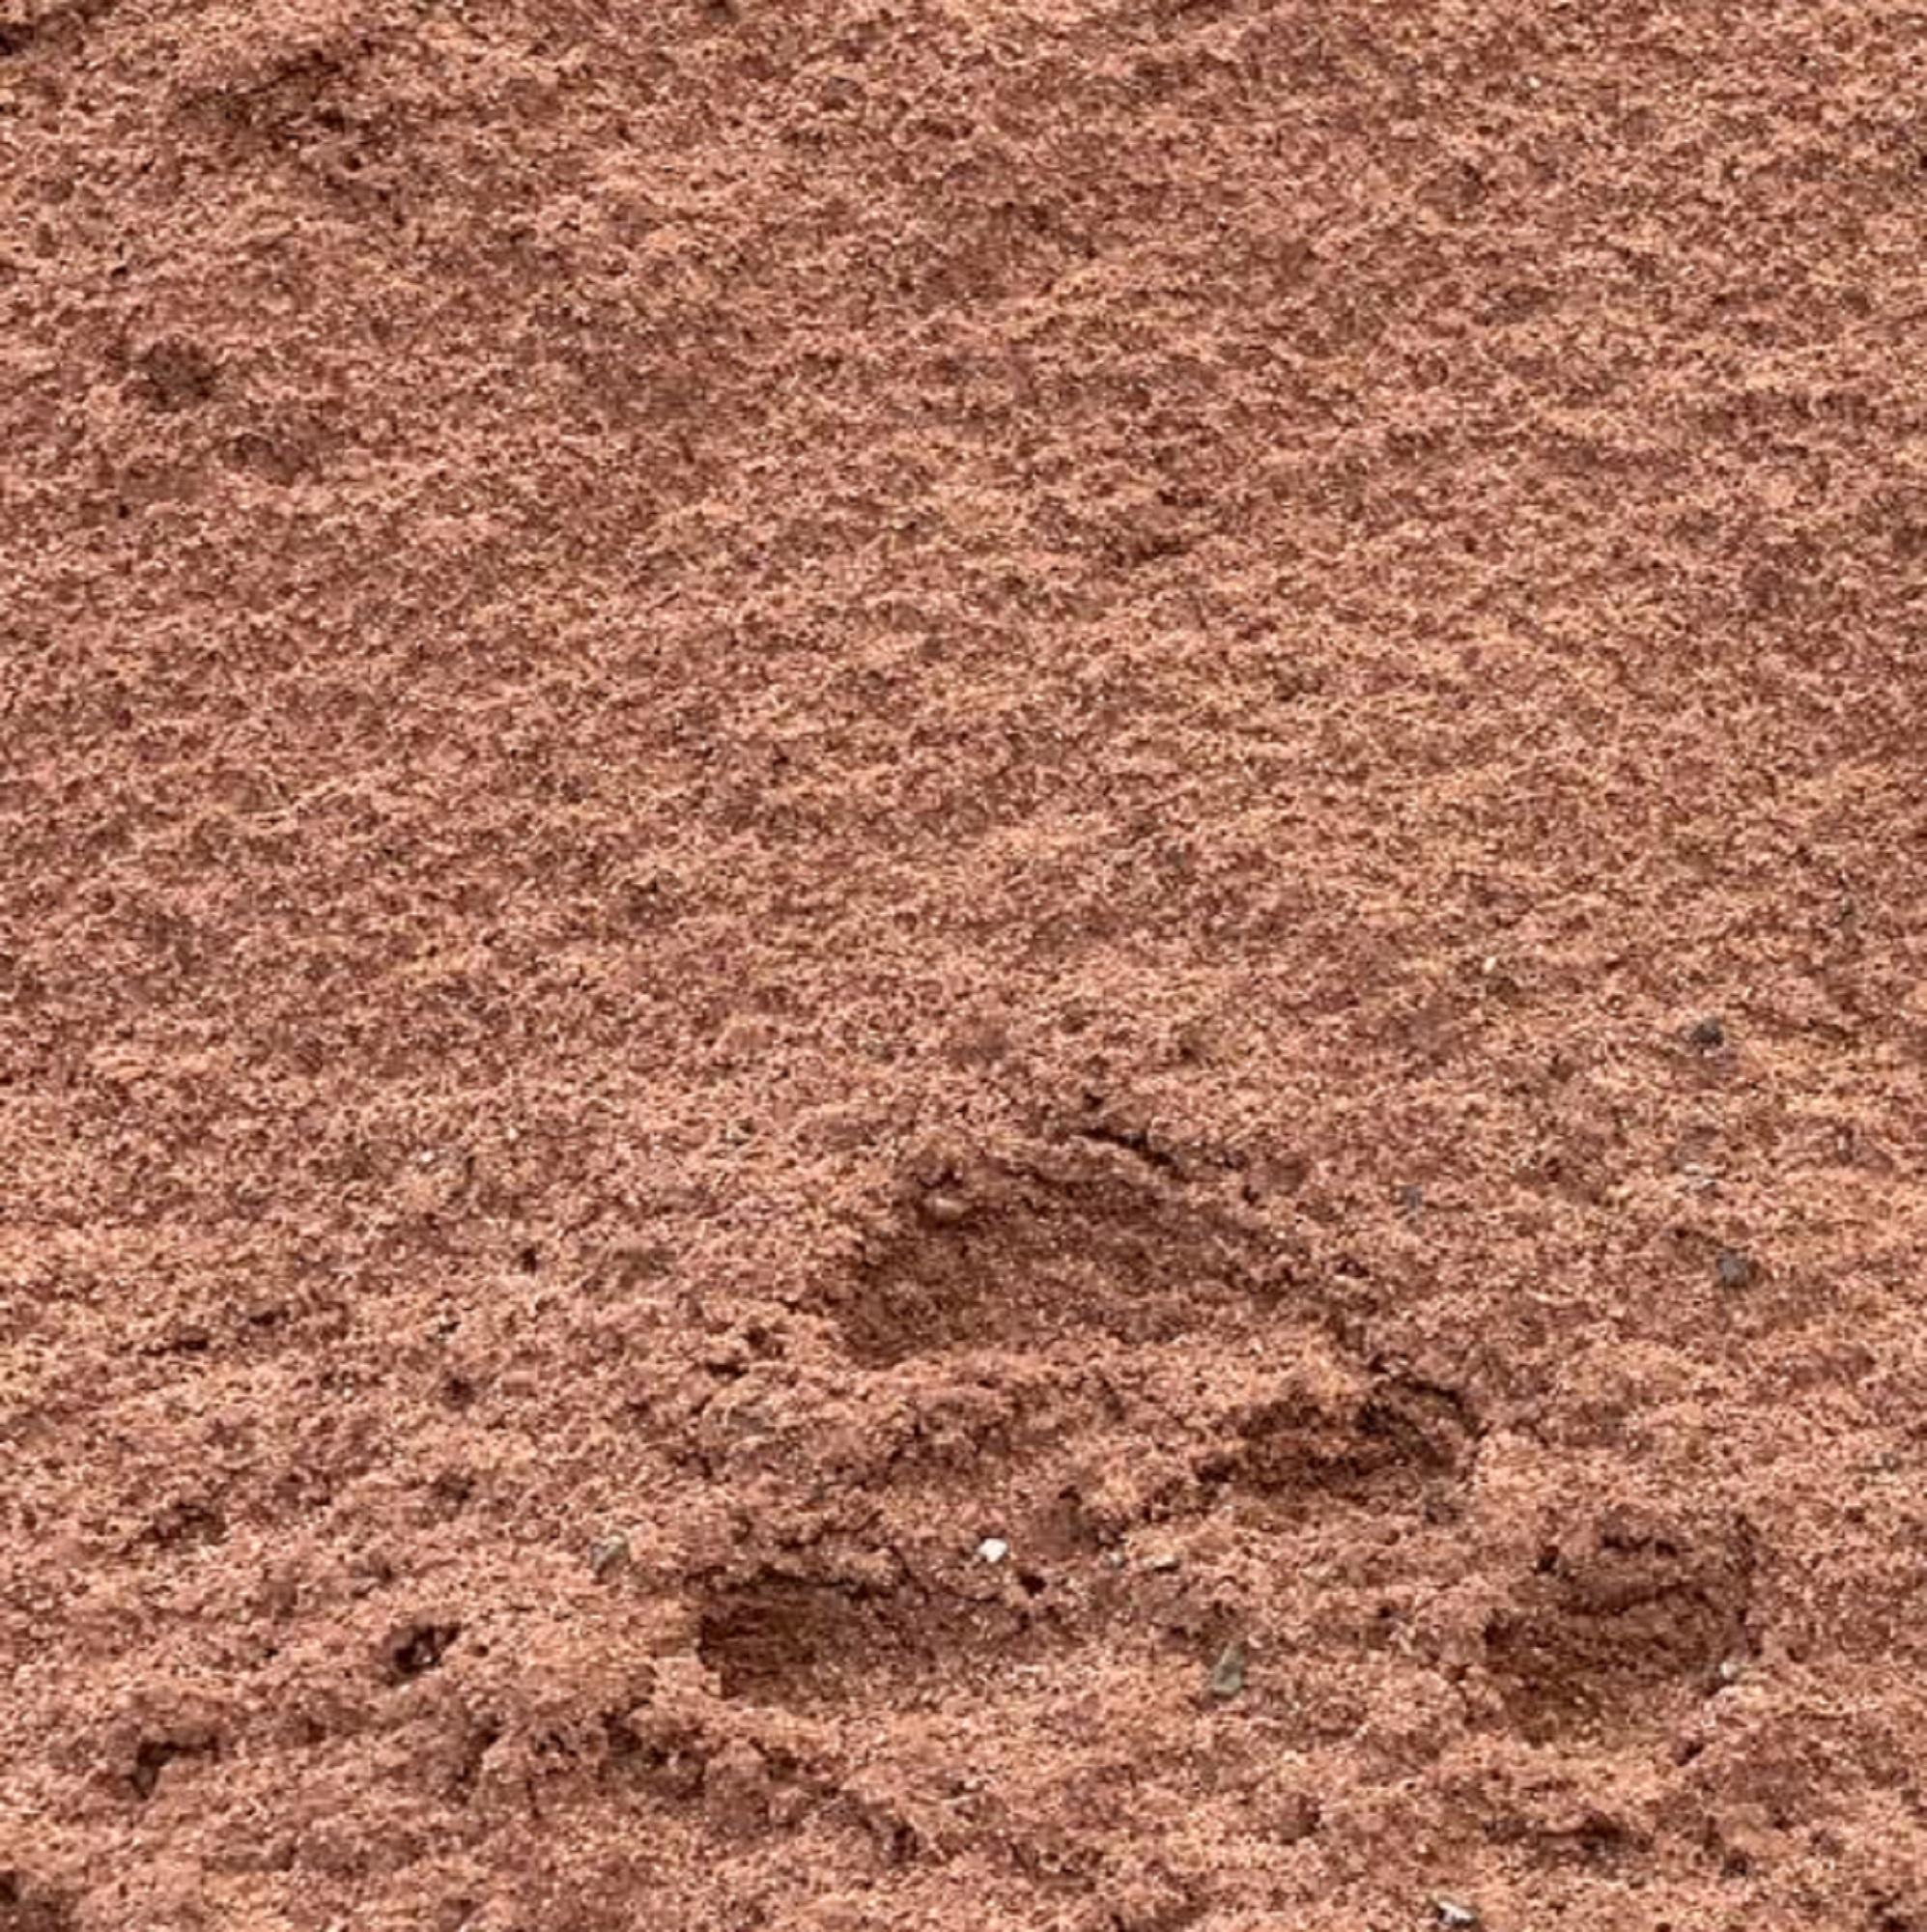 Bedding sand.jpg